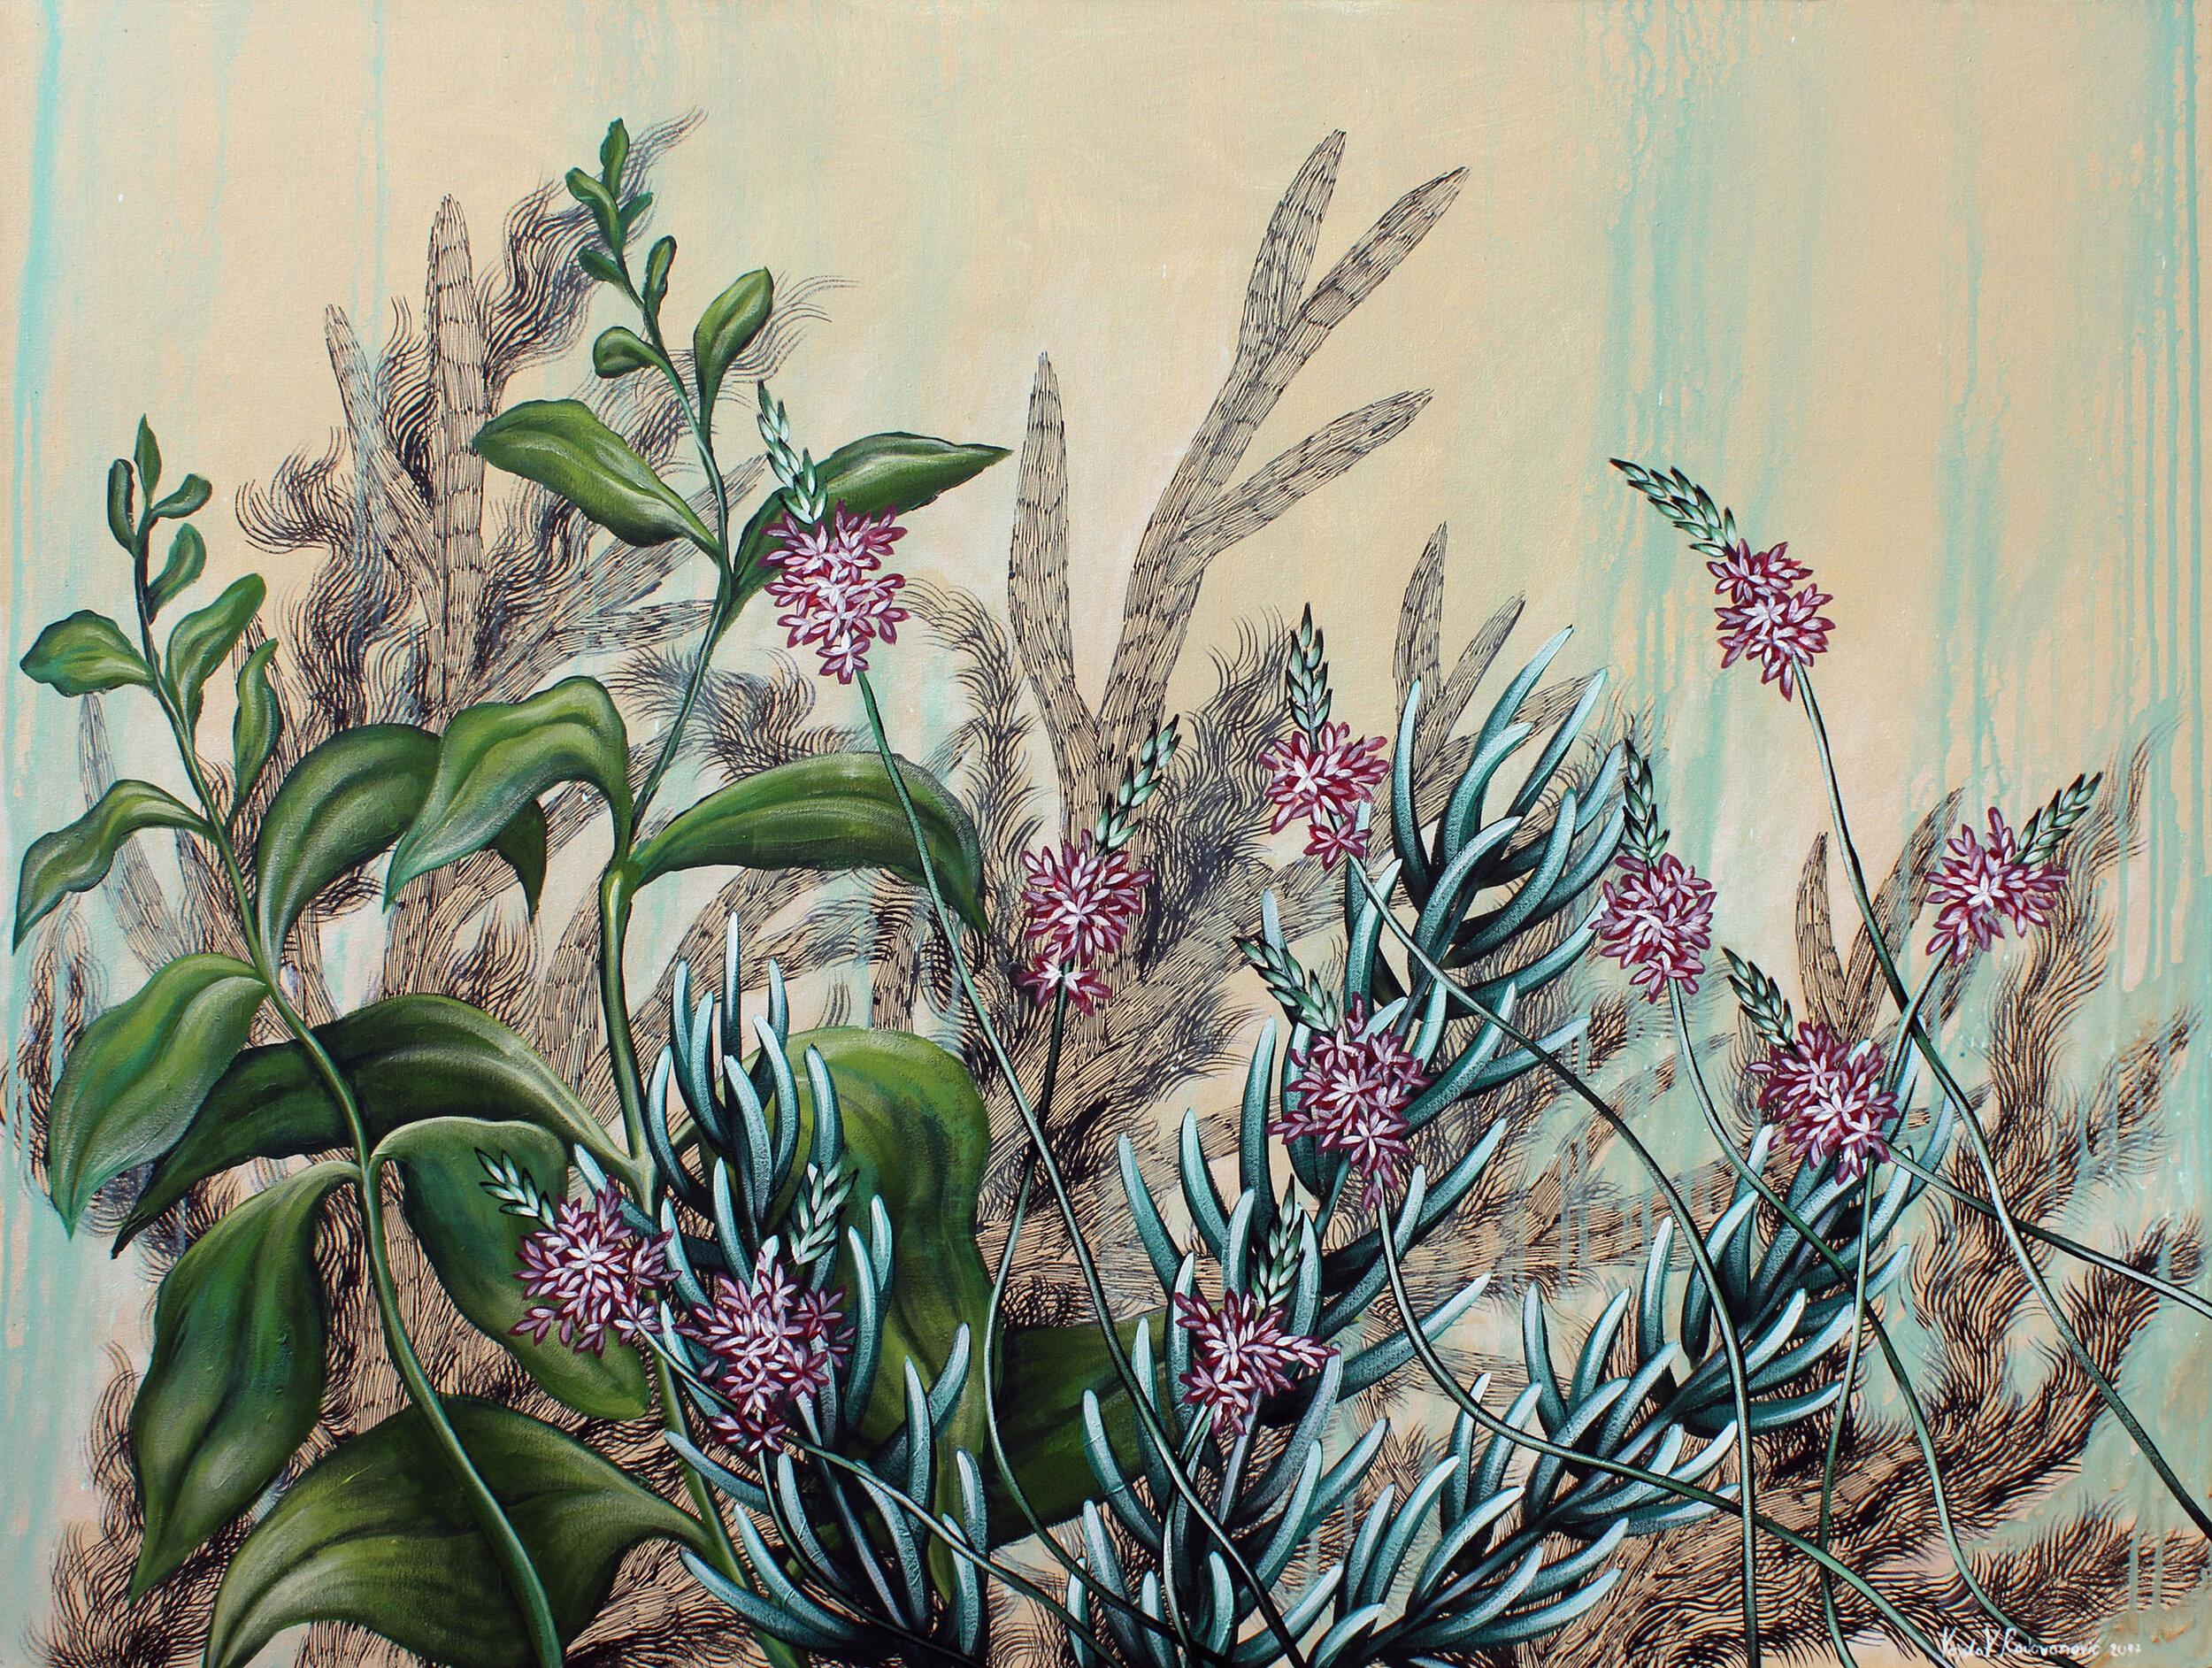 Myor's Choice, Californian Weeds - Vojislav Radovanovic